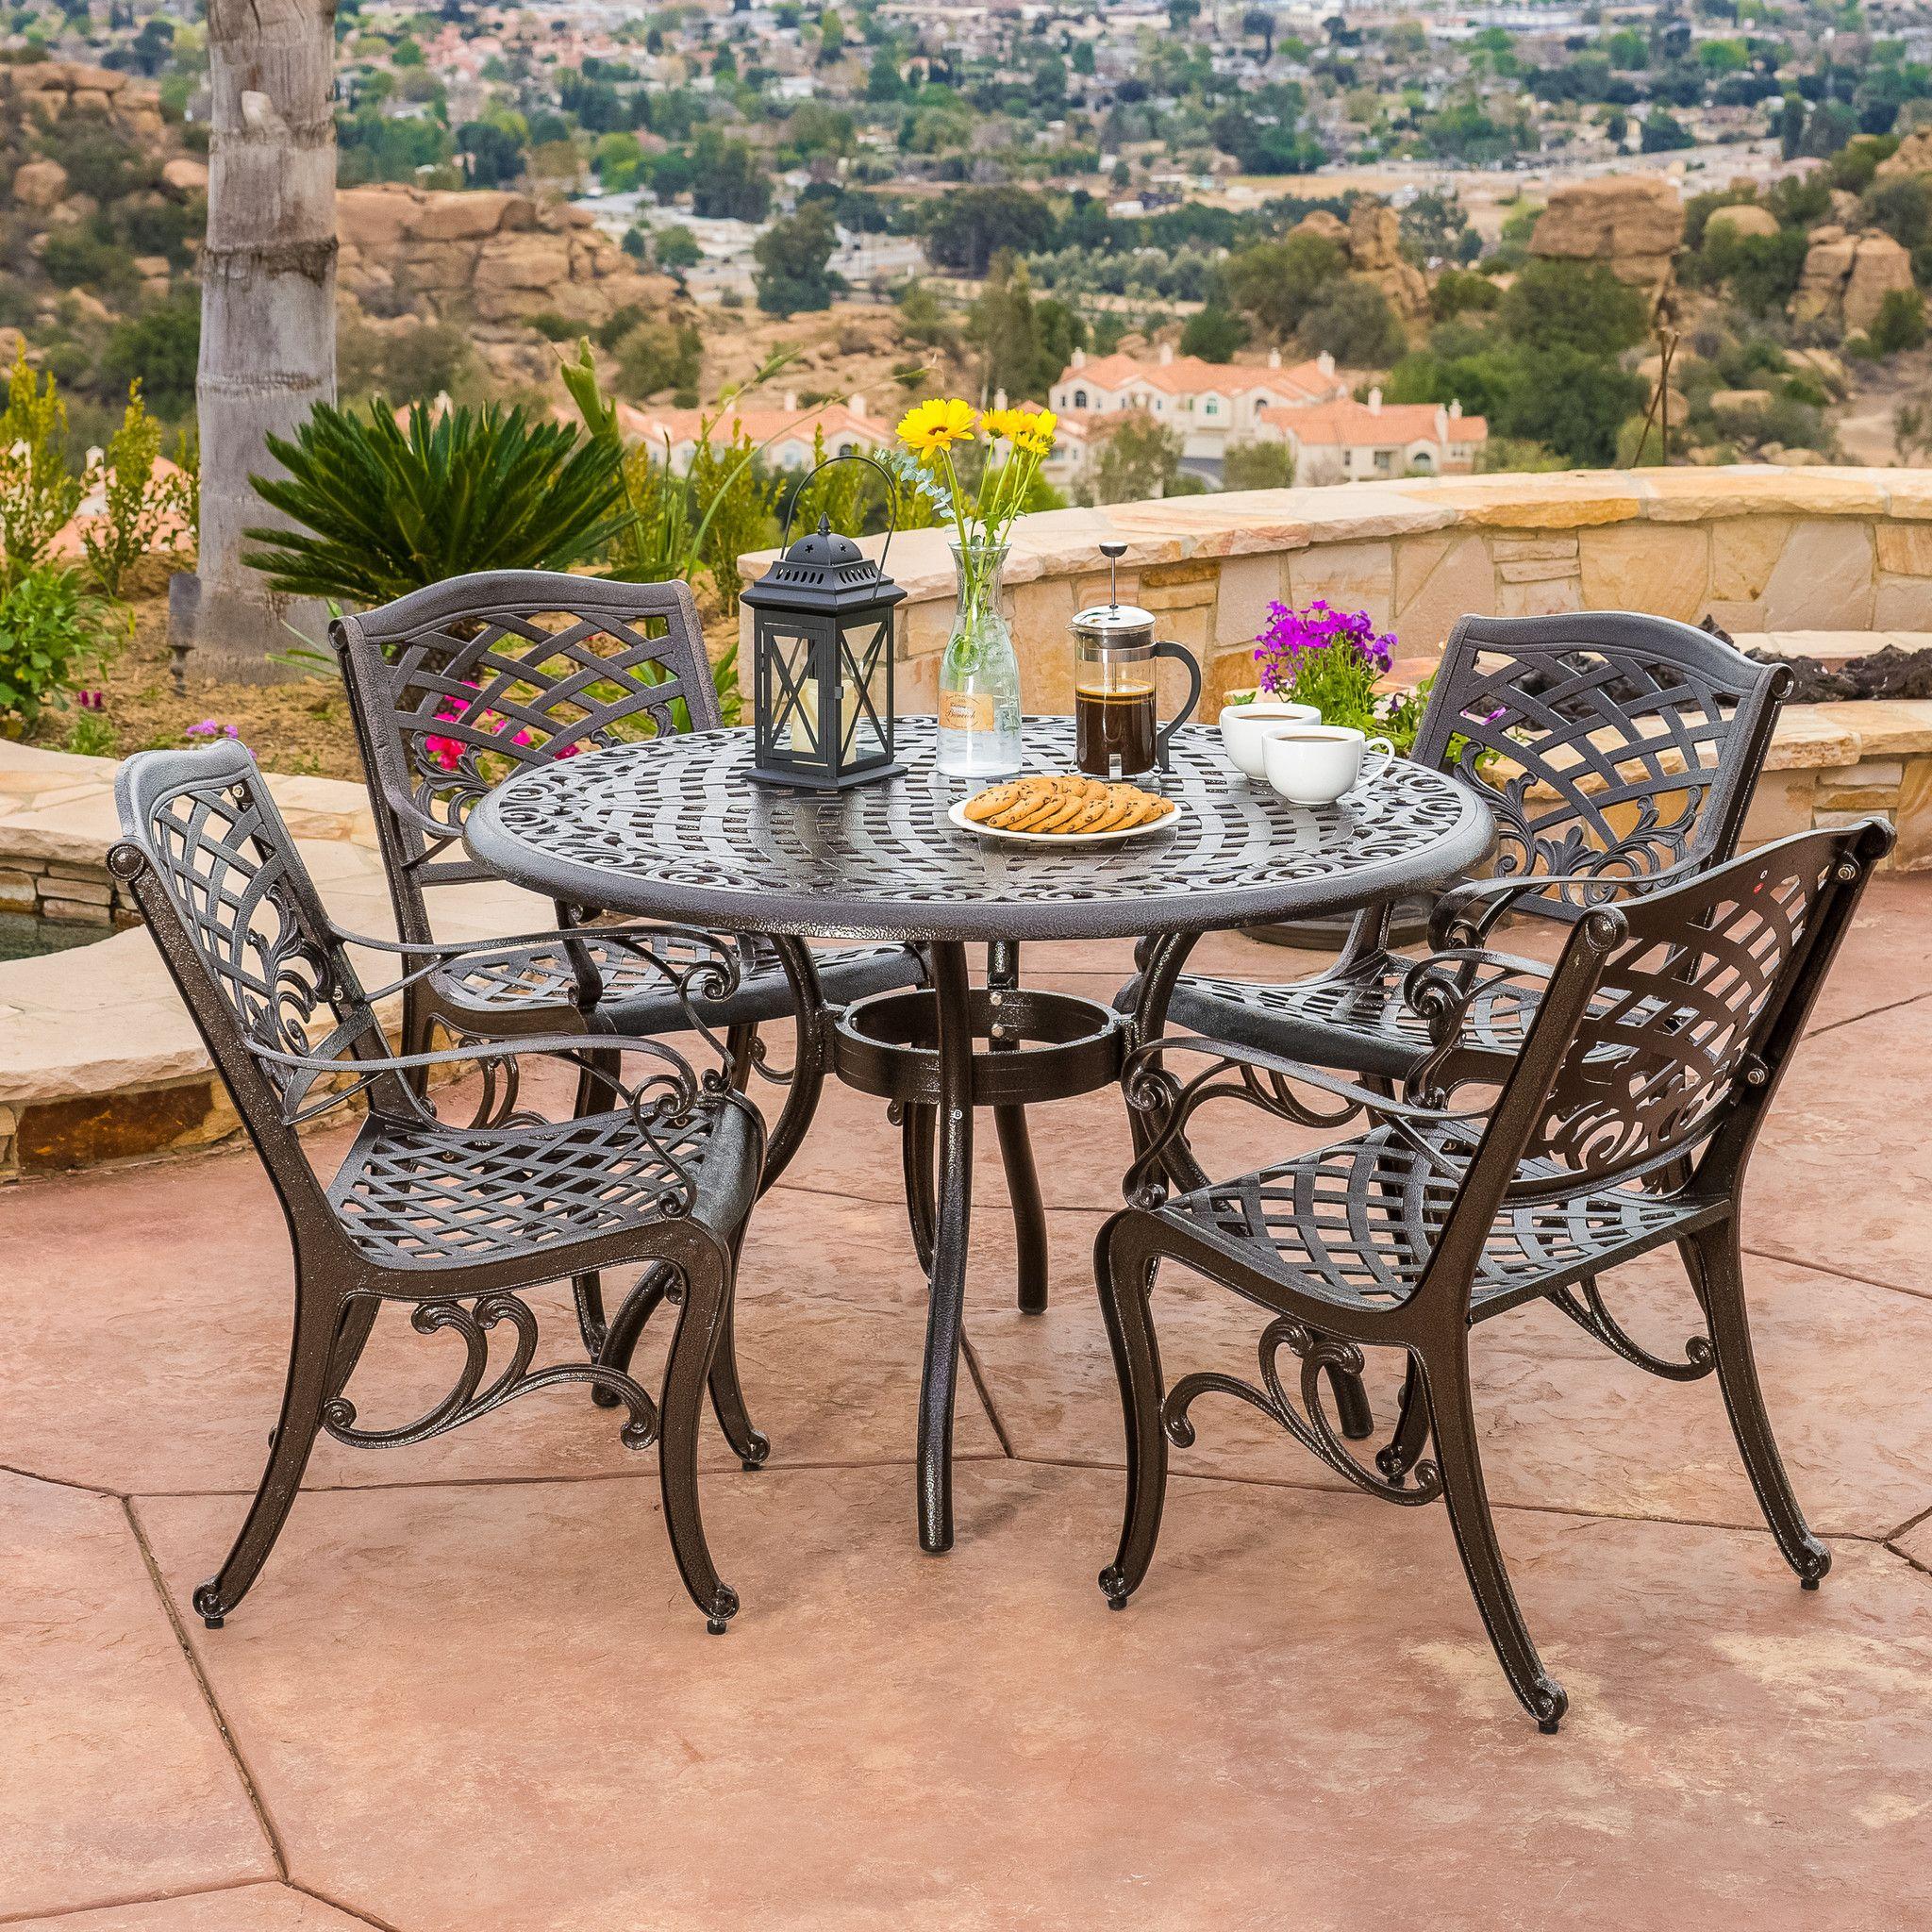 Covington Outdoor 5 Piece Bronze Cast Aluminum Dining Set With Umbrella Hole Outdoor Dining Set Cast Aluminum Patio Furniture Patio Furniture Sets